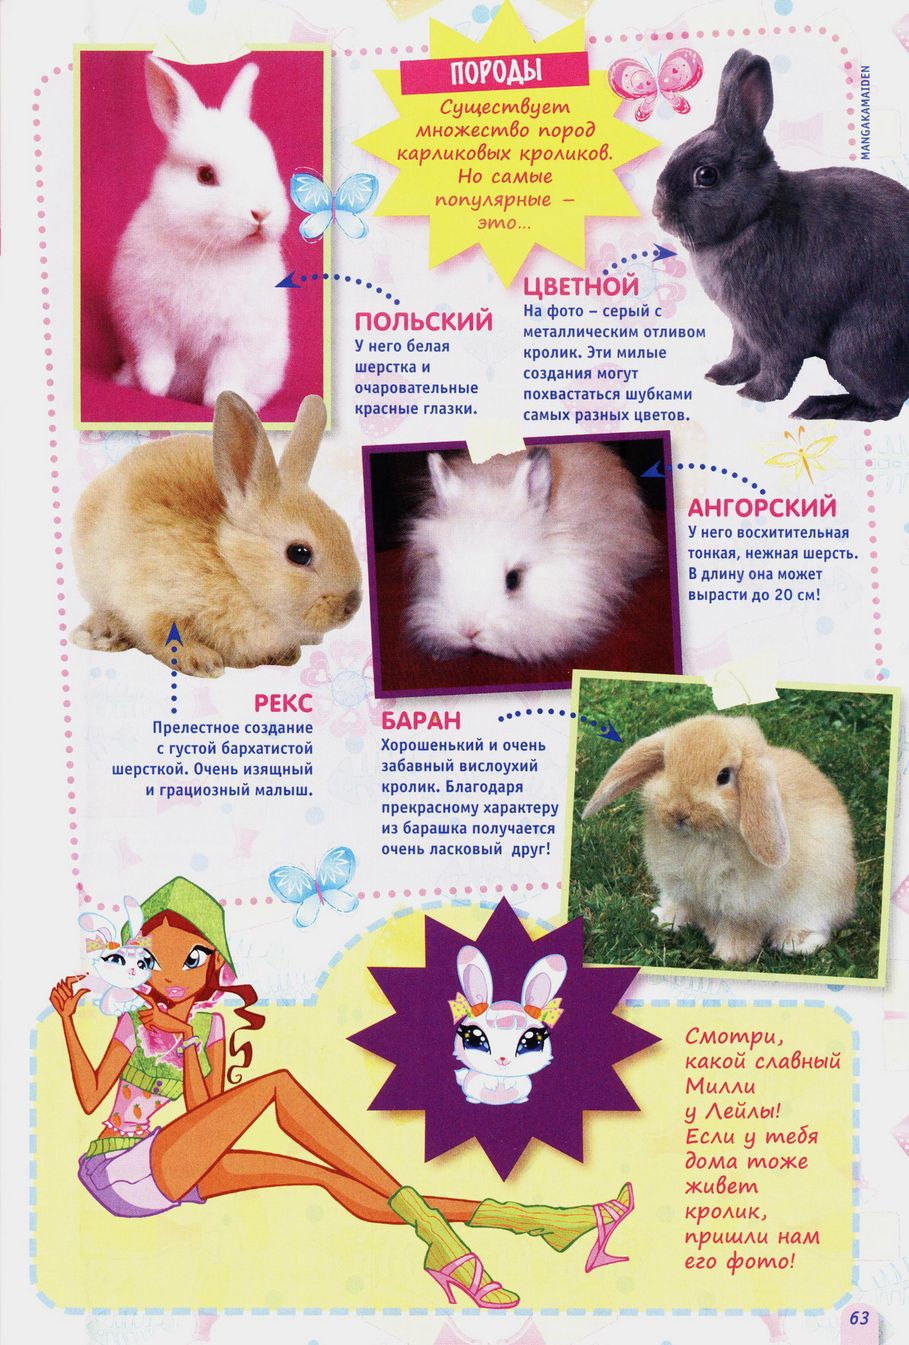 Комикс Винкс Winx - Неверное решение (Журнал Винкс №3 2011) - стр. 63